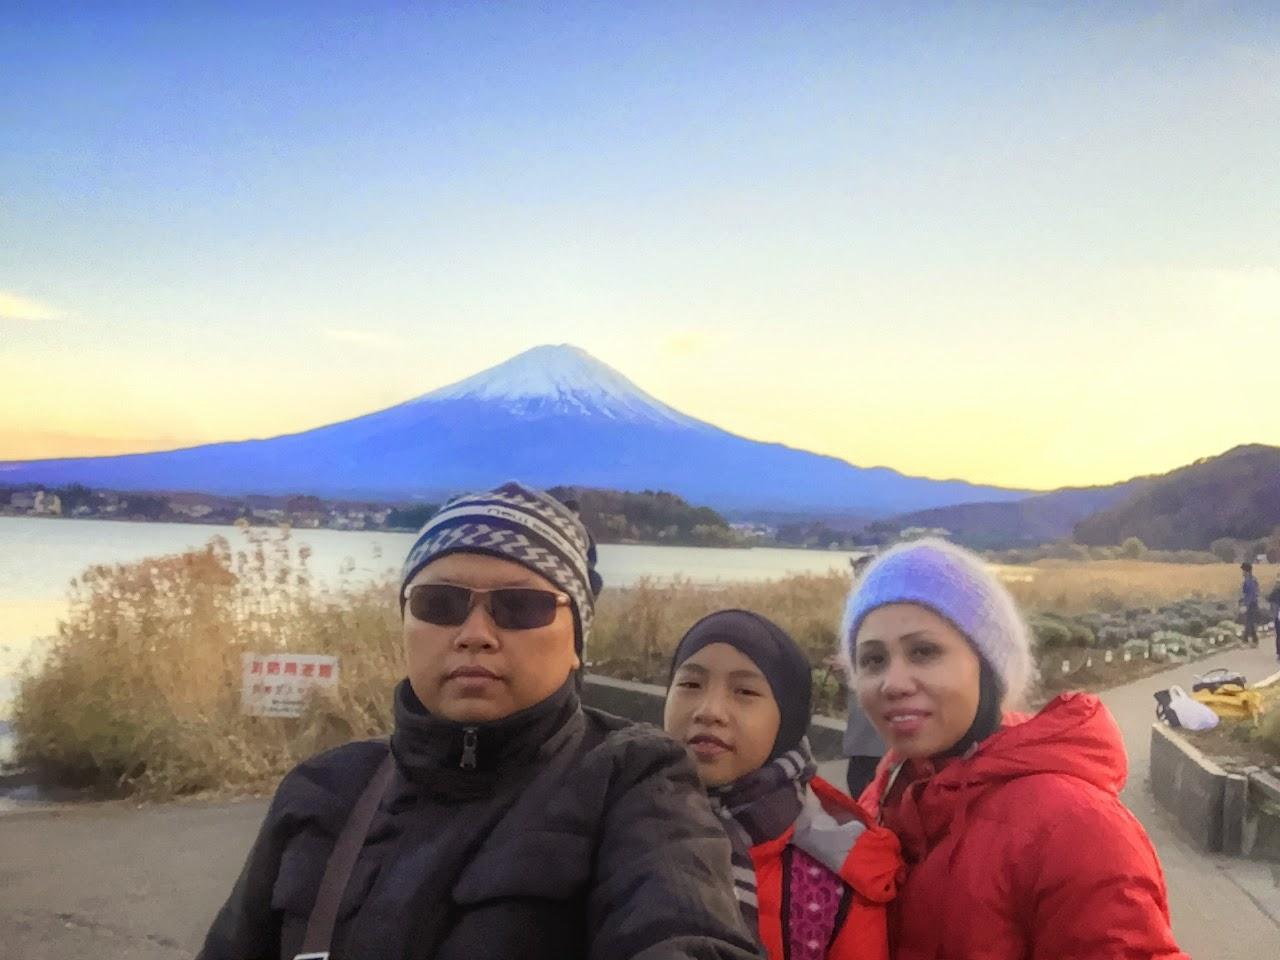 Japan, Nov/Dec 2014